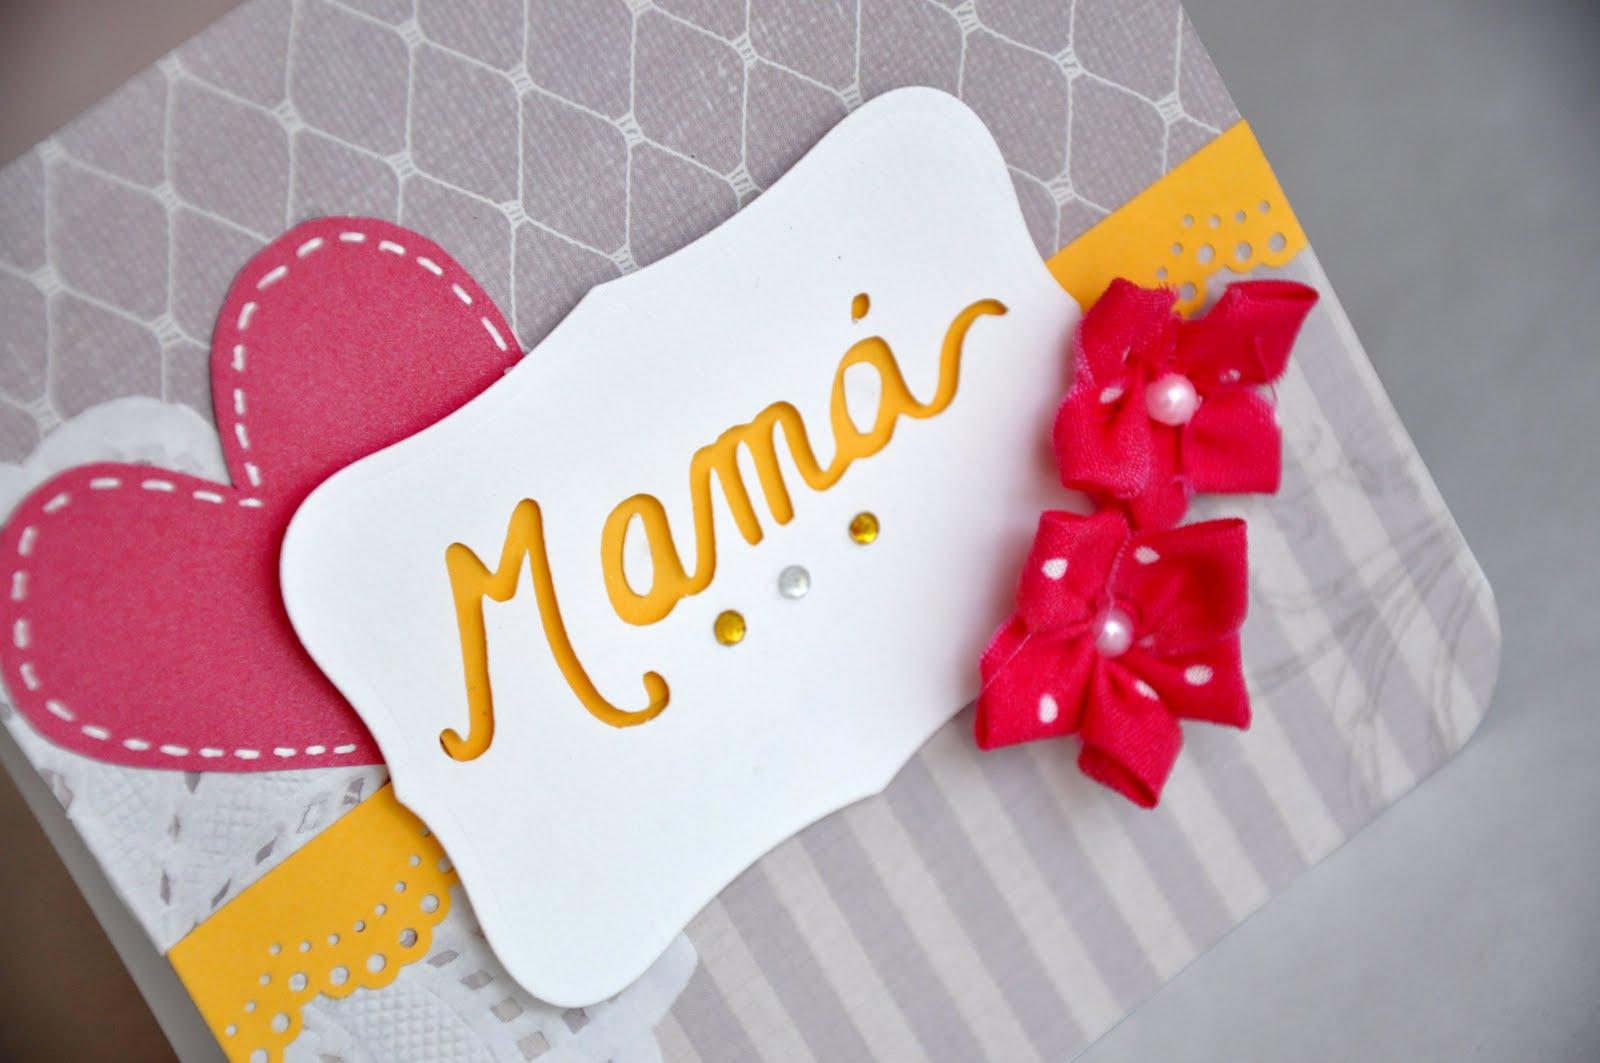 http://3.bp.blogspot.com/-SMZRPeH5Fqw/UYeAeif1AlI/AAAAAAAABiA/GdsEhQROjb0/s1600/mama.jpg